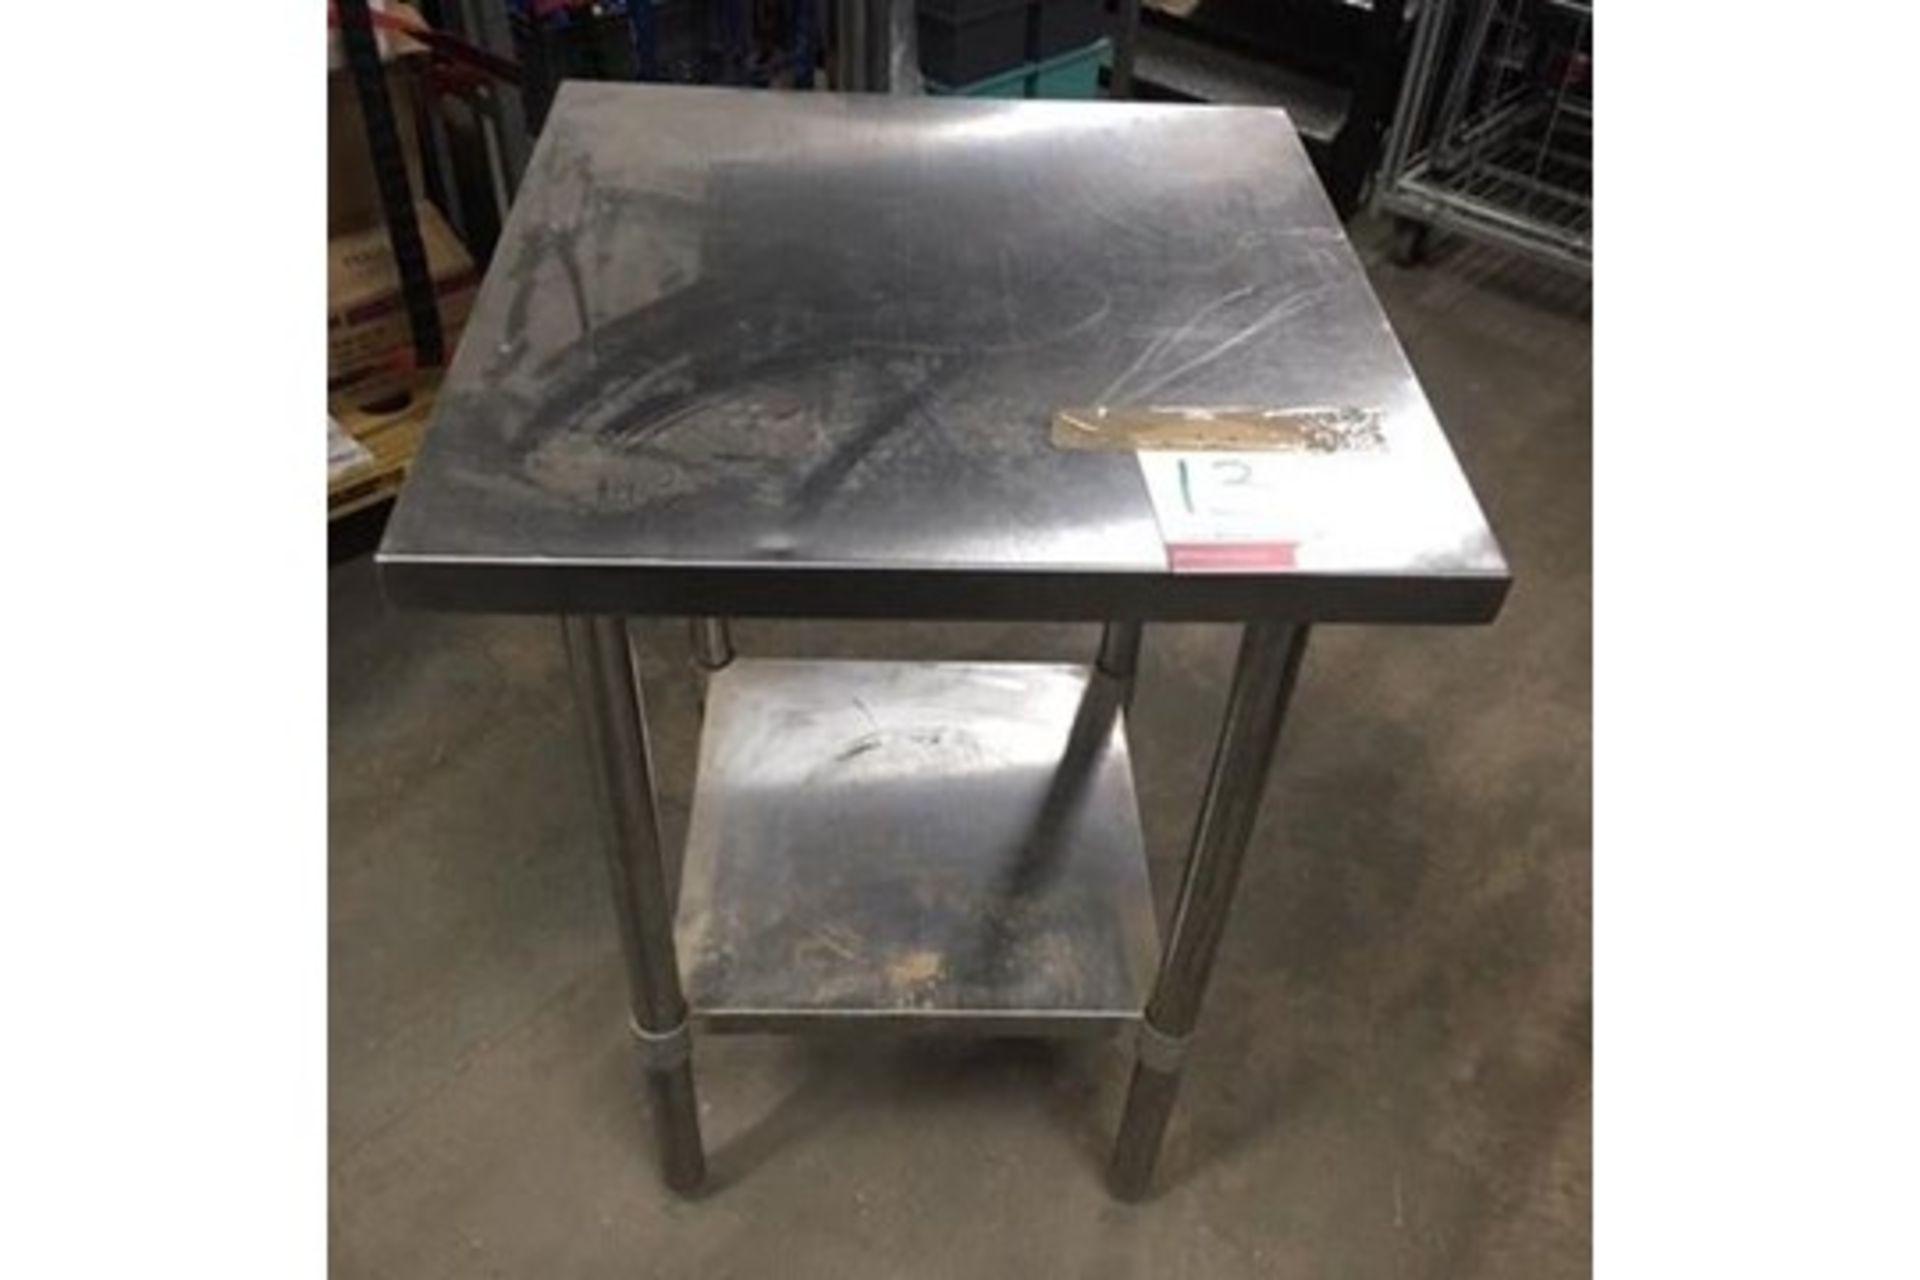 Lot 13 - Stainless Steel Preparation Table w/ Undershelf